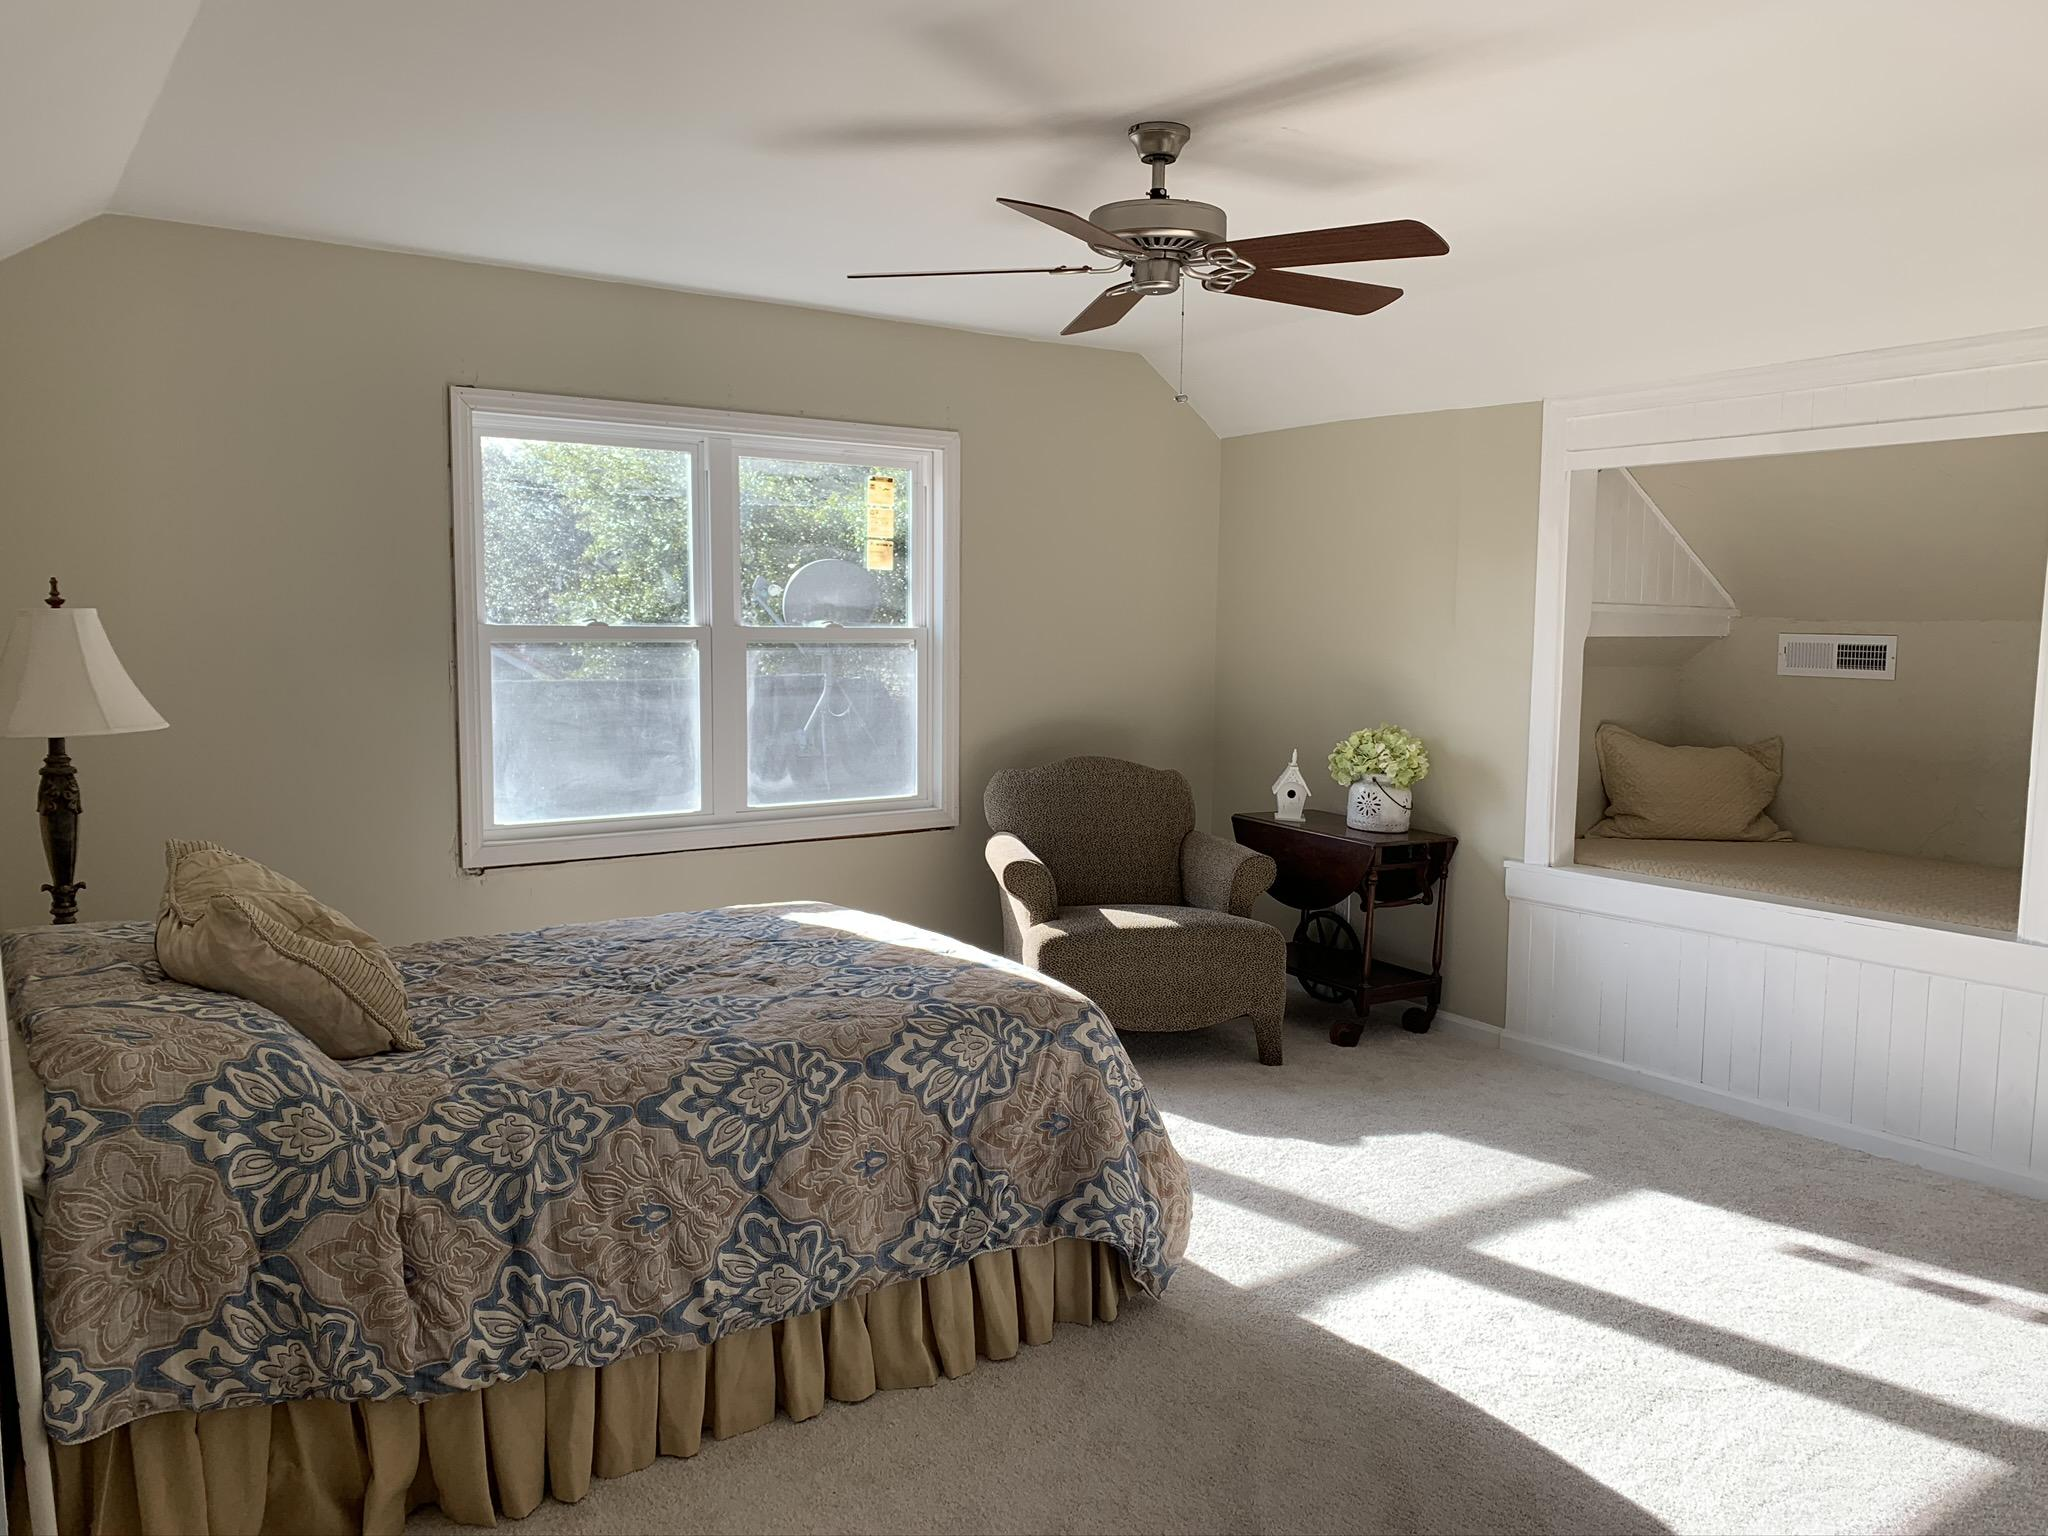 Fox Pond Homes For Sale - 662 Poaug, Mount Pleasant, SC - 12